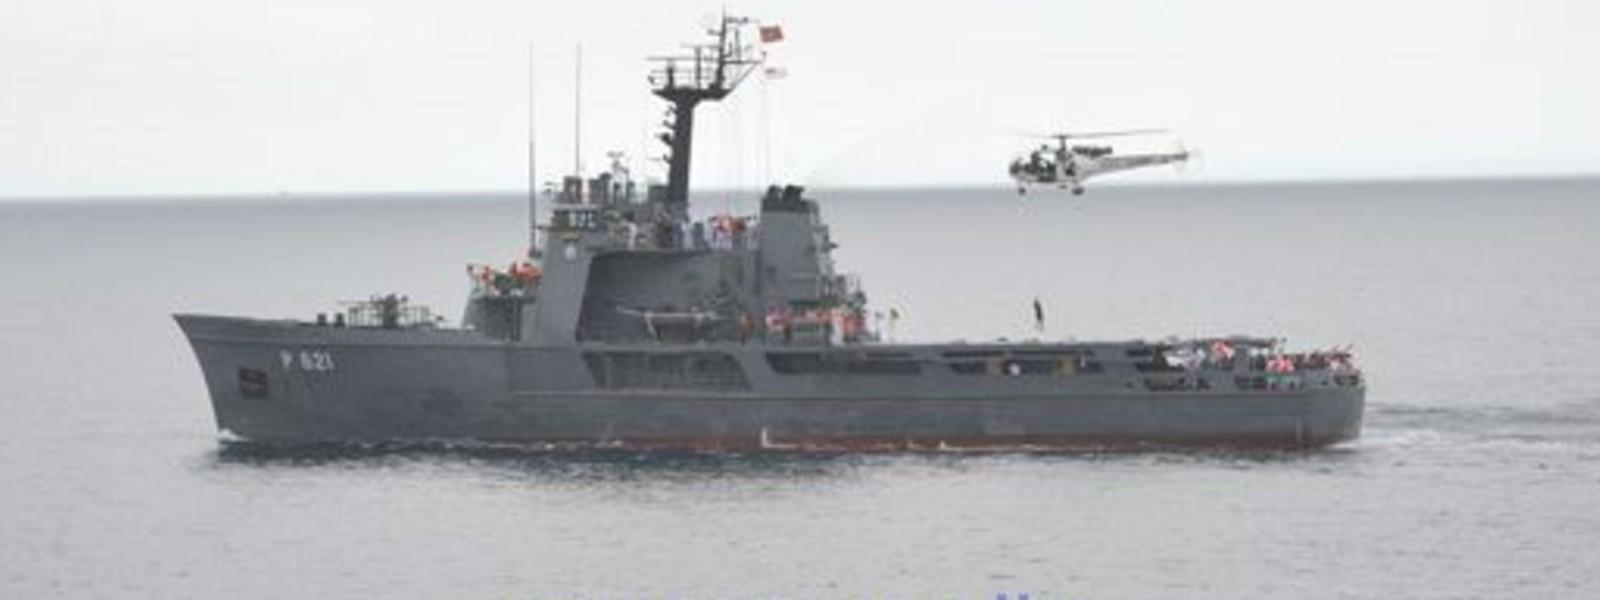 Sri Lanka Navy Ship Samudura deployed to assist distressed Fishing Trawlers